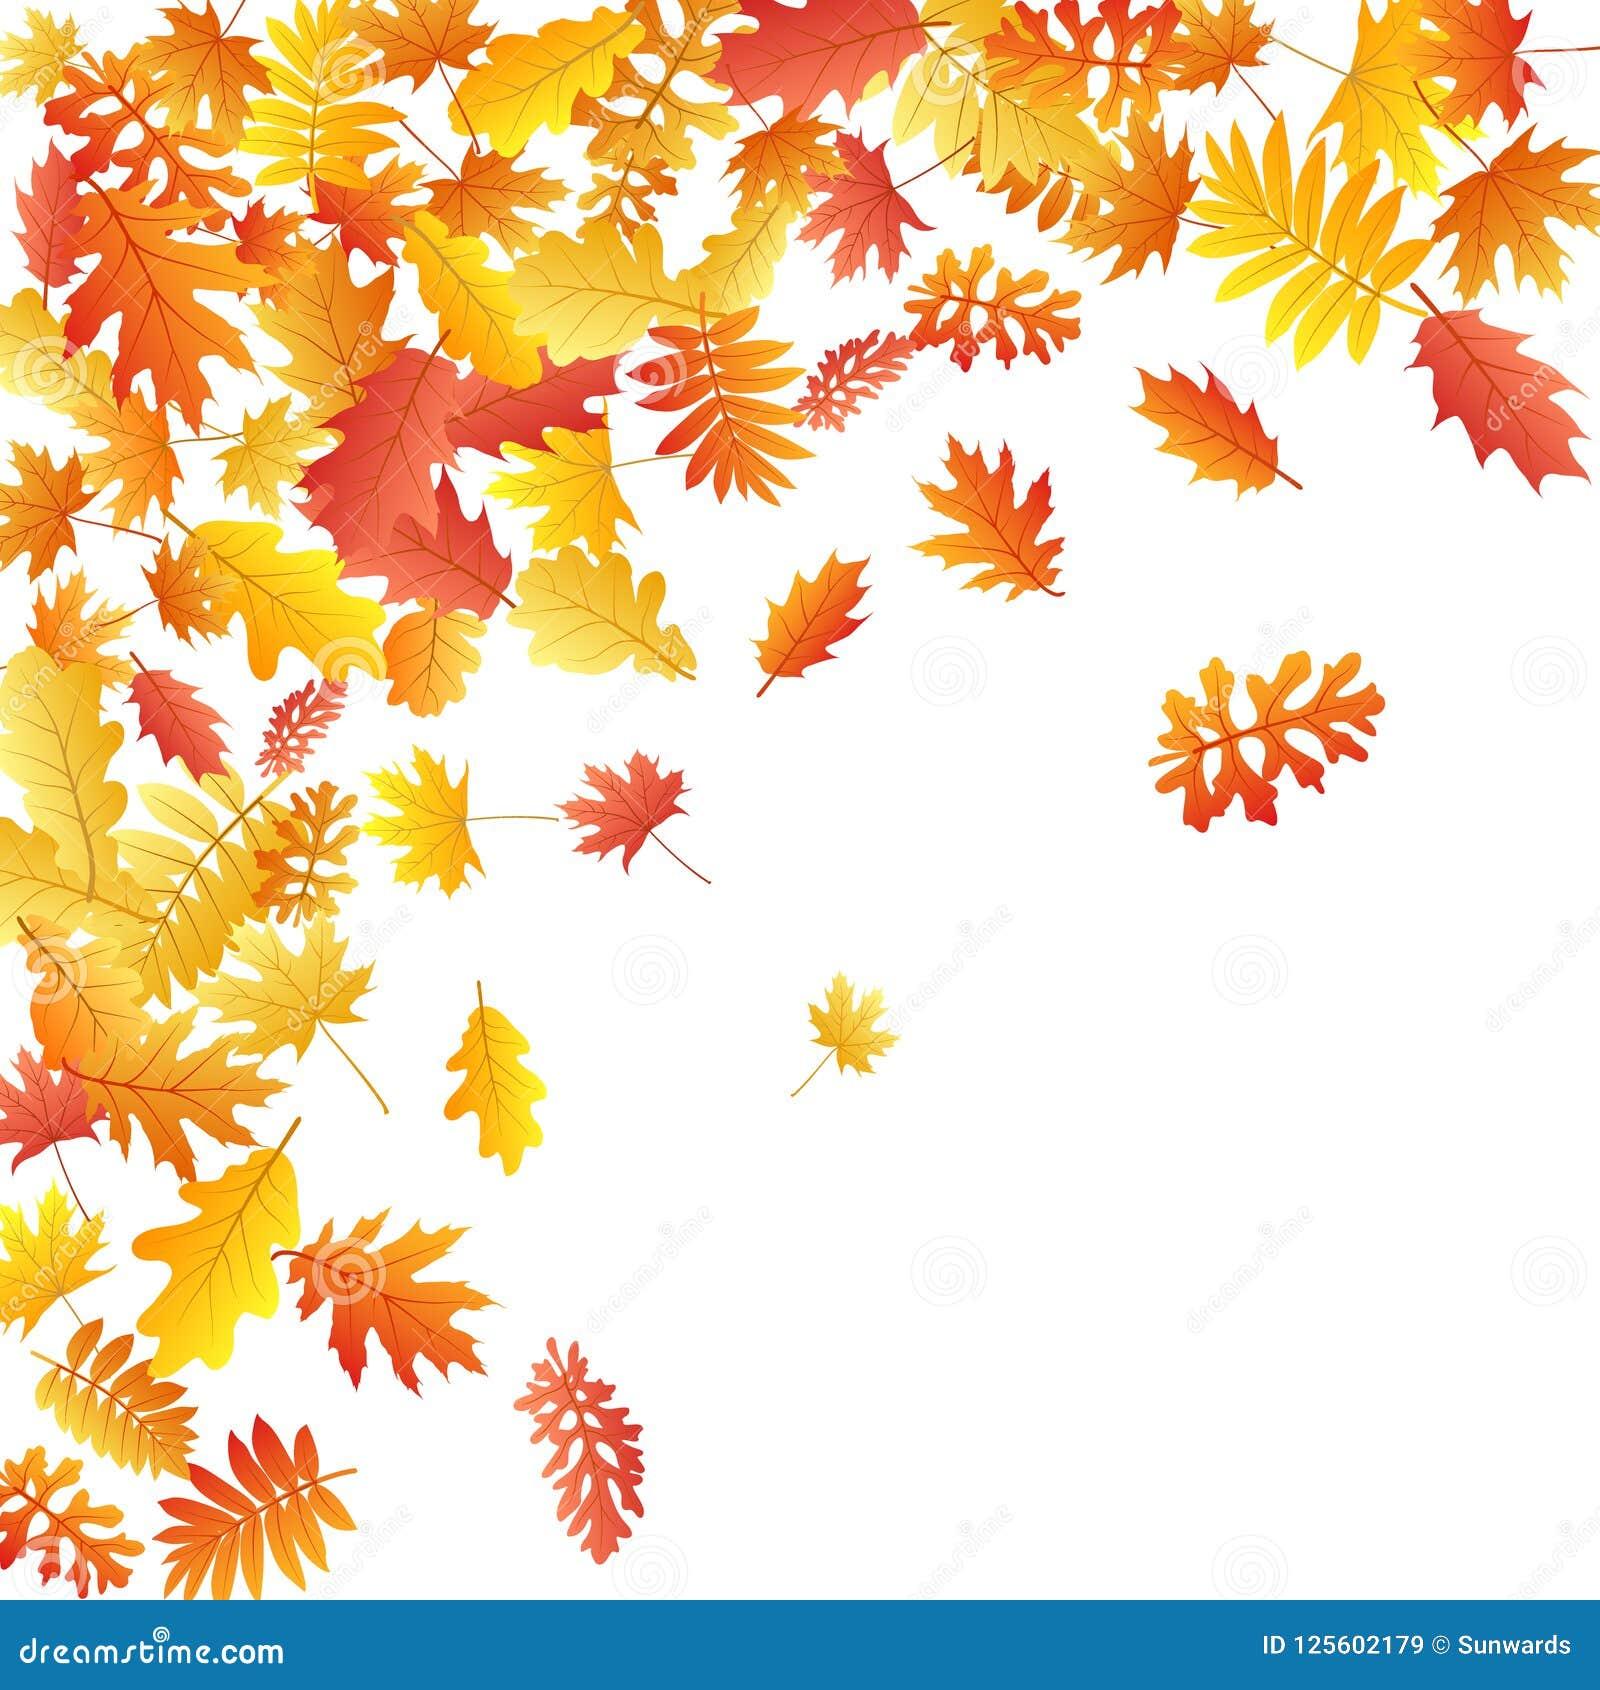 Oak, maple, wild ash rowan leaves vector, autumn foliage on white background.